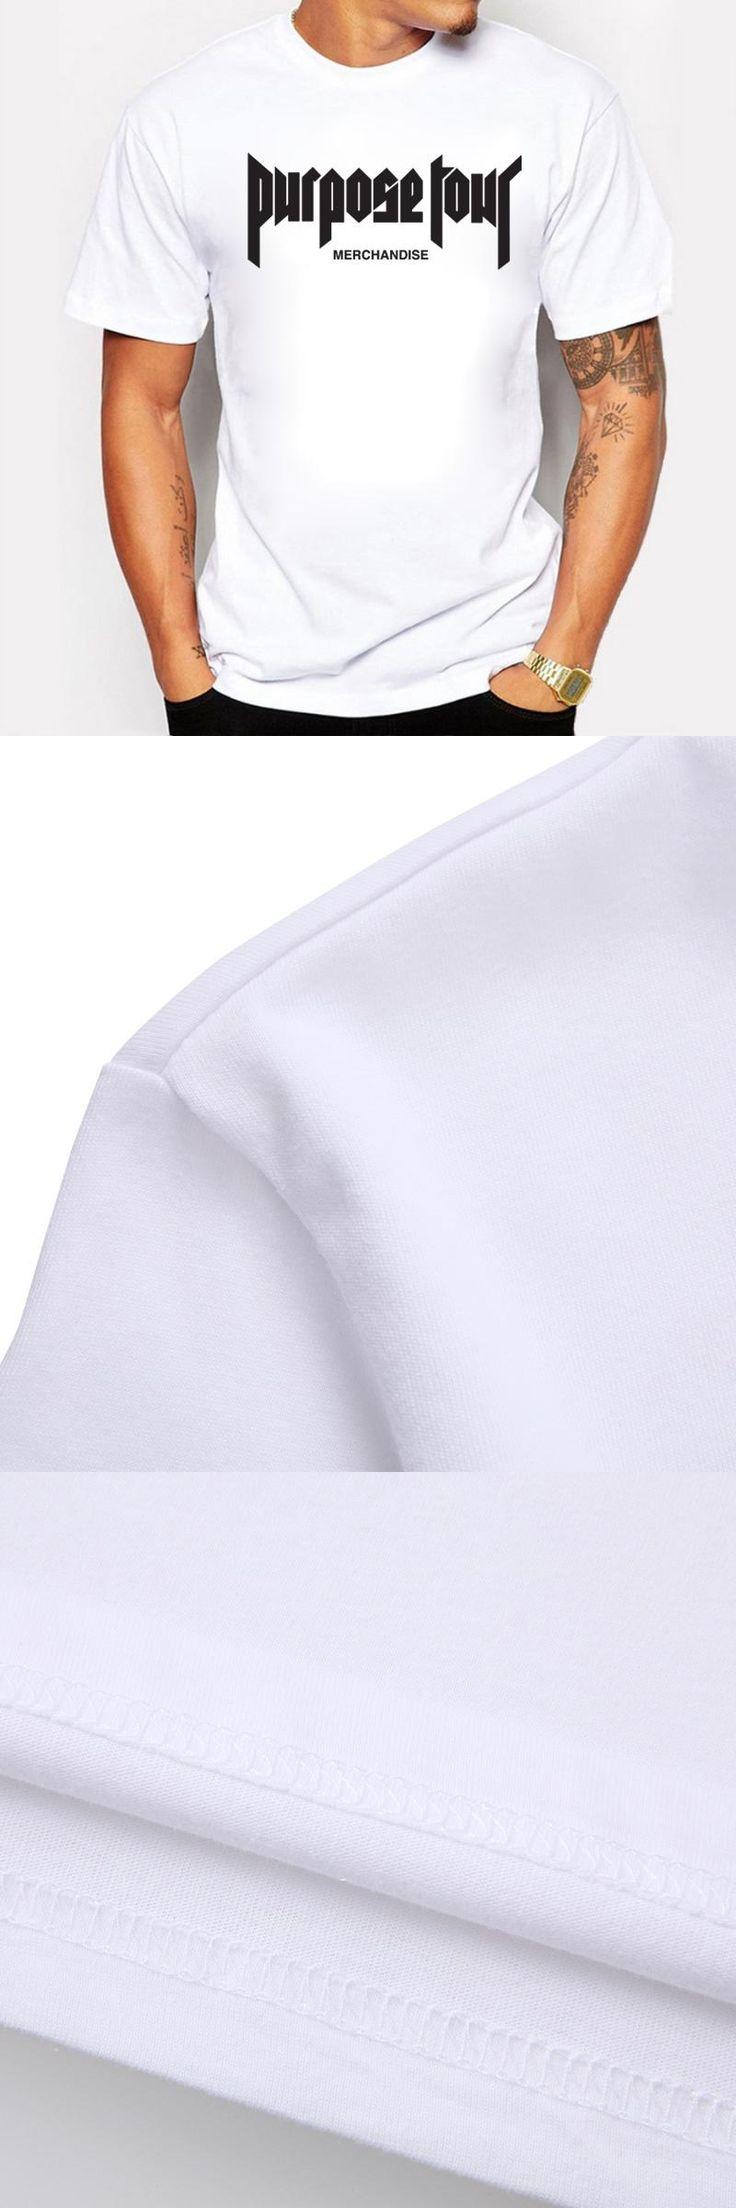 BLWHSA Popular Singner Justin Bieber Concert Purpose tour Merchandise Letters Print Men T-shirt Hip Hop Swag Cotton Men Tshirt